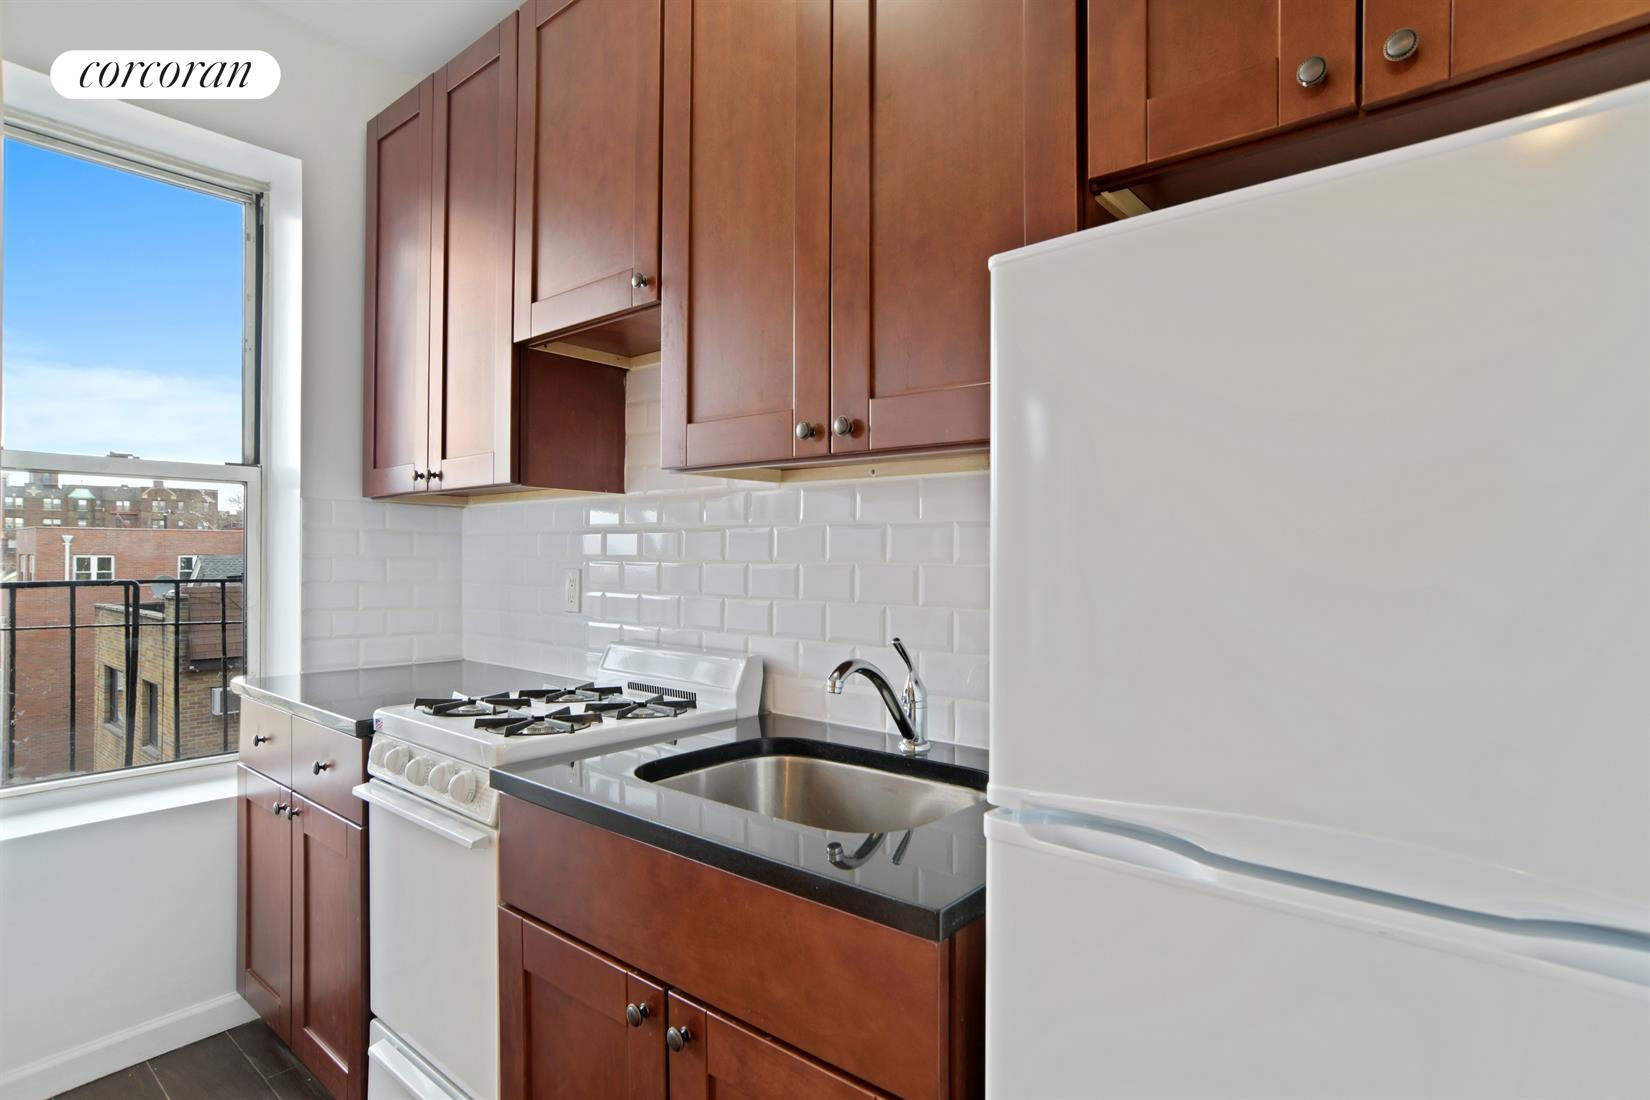 Corcoran, 42-22 Ketcham Street, Apt. D 10, Elmhurst Real Estate ...